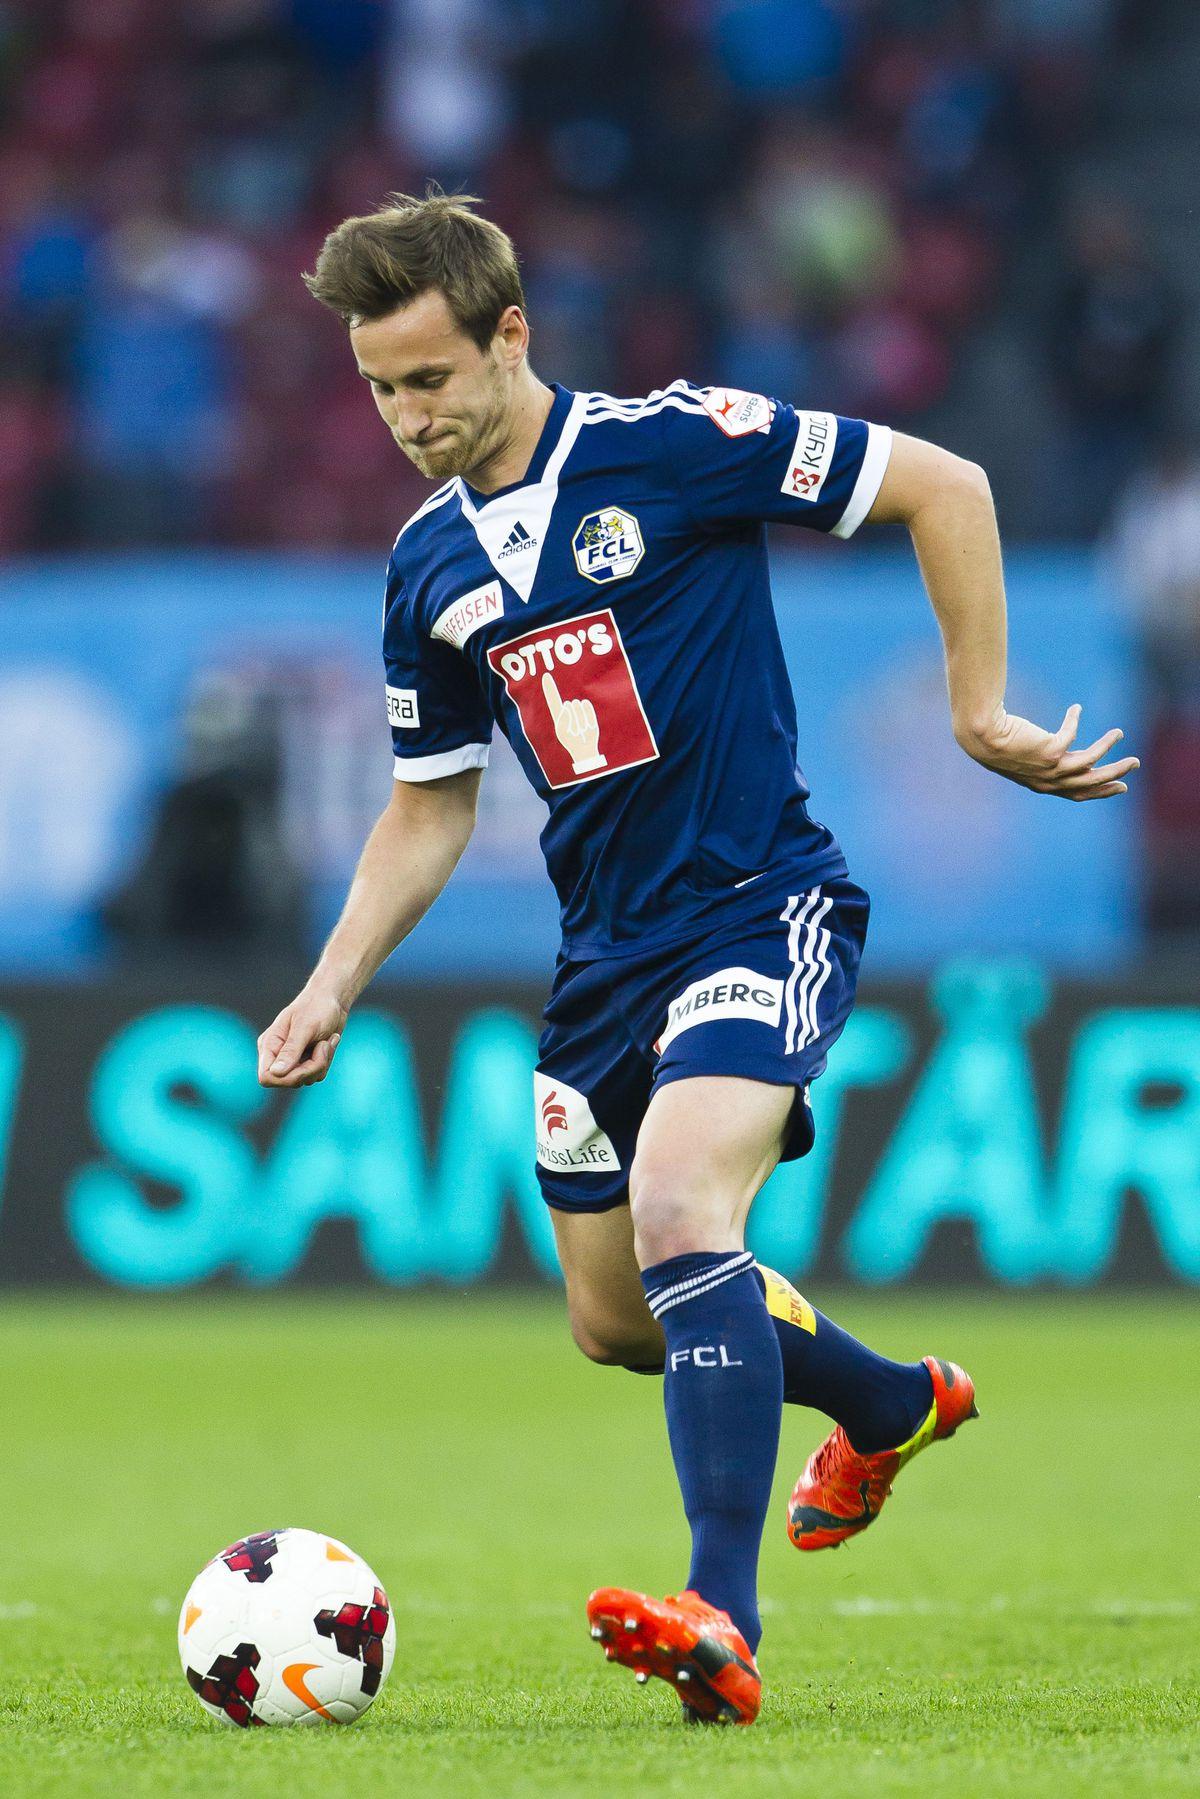 FC Zurich v FC Luzern - Swiss Super League